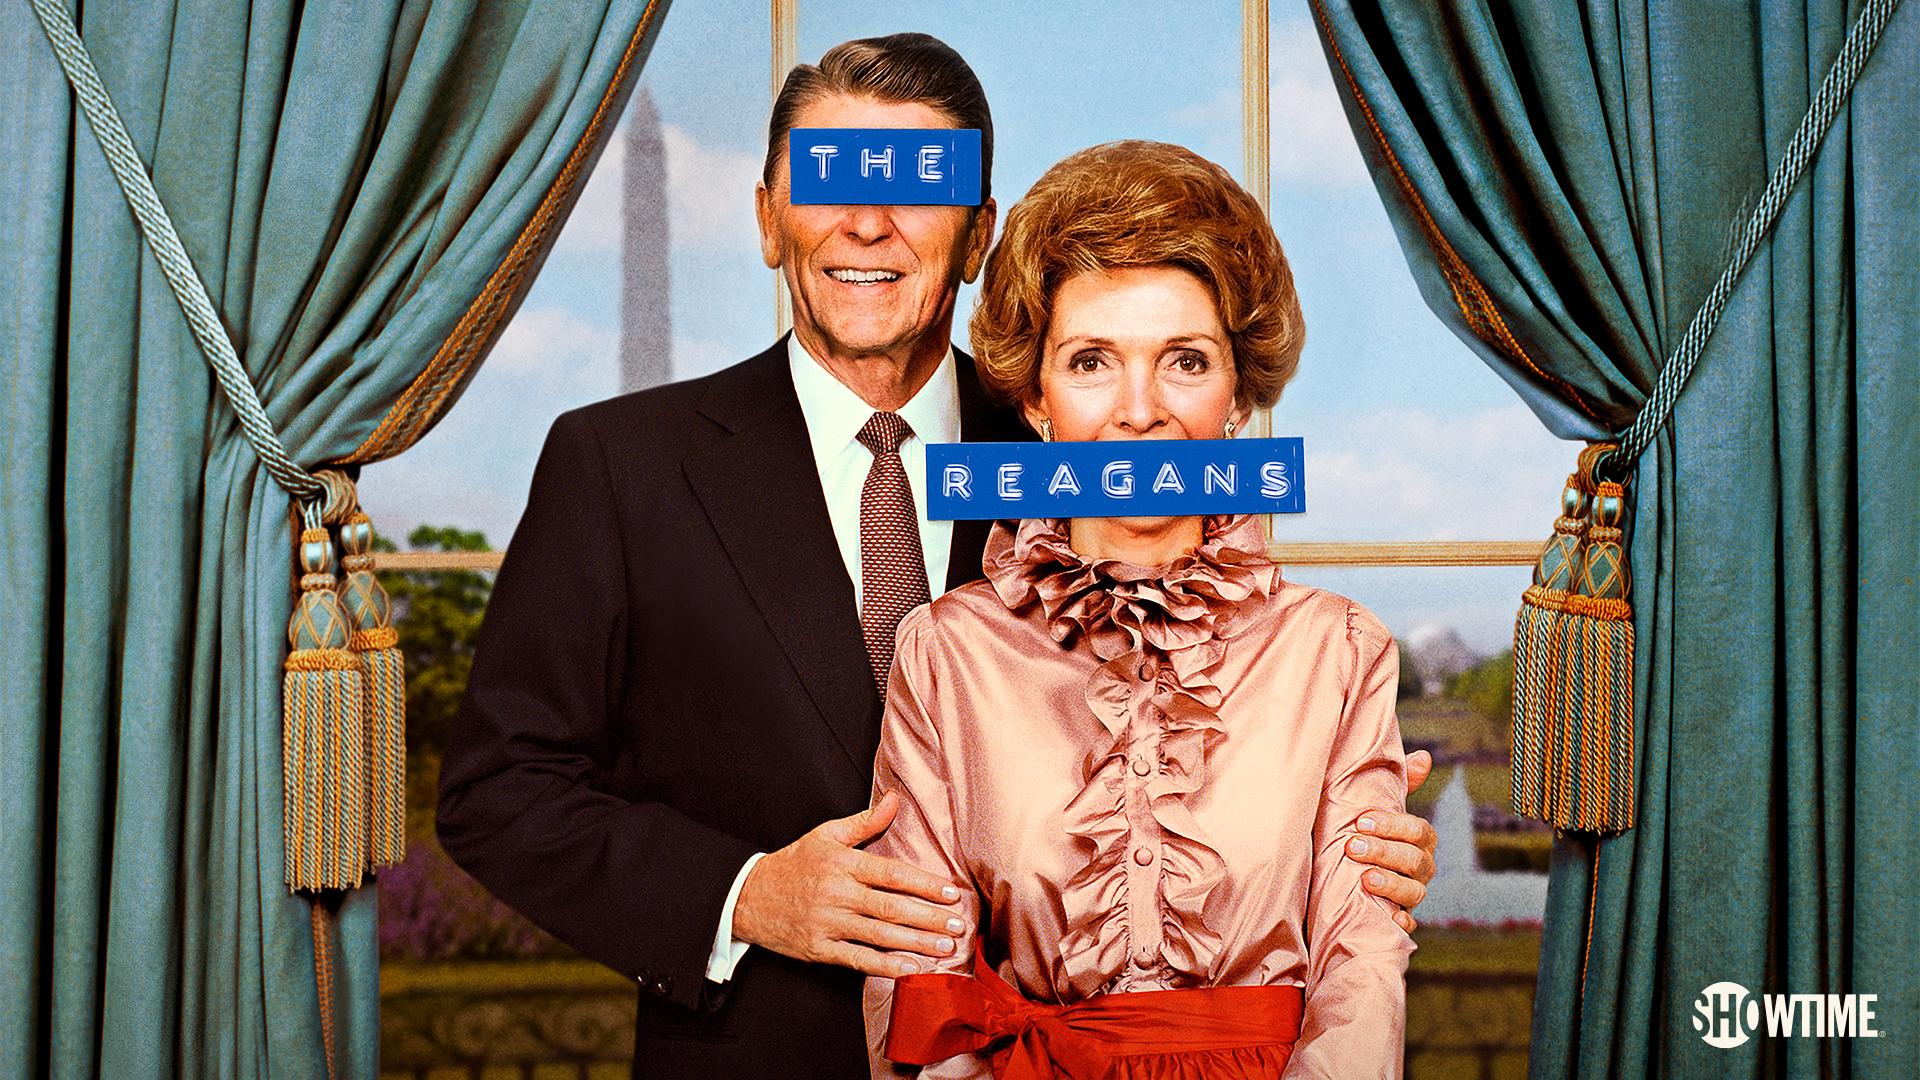 Reagans, The (Limited Series) Season 1